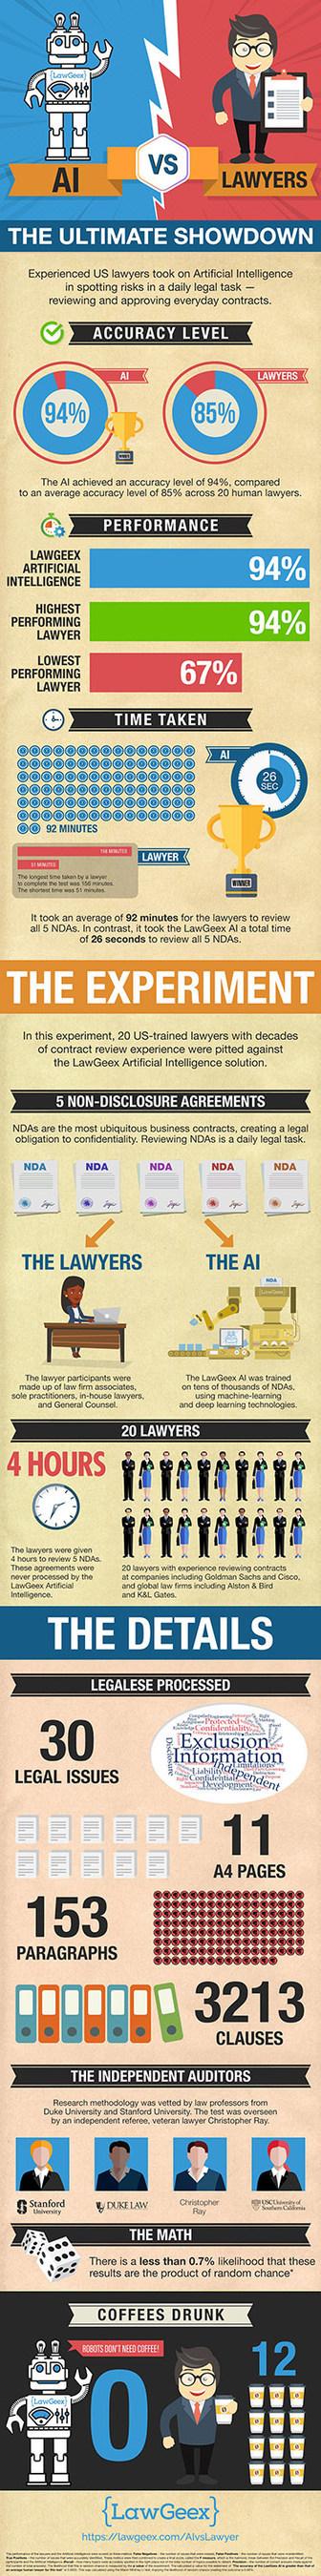 AI Vs. Lawyers: The Ultimate Showdown